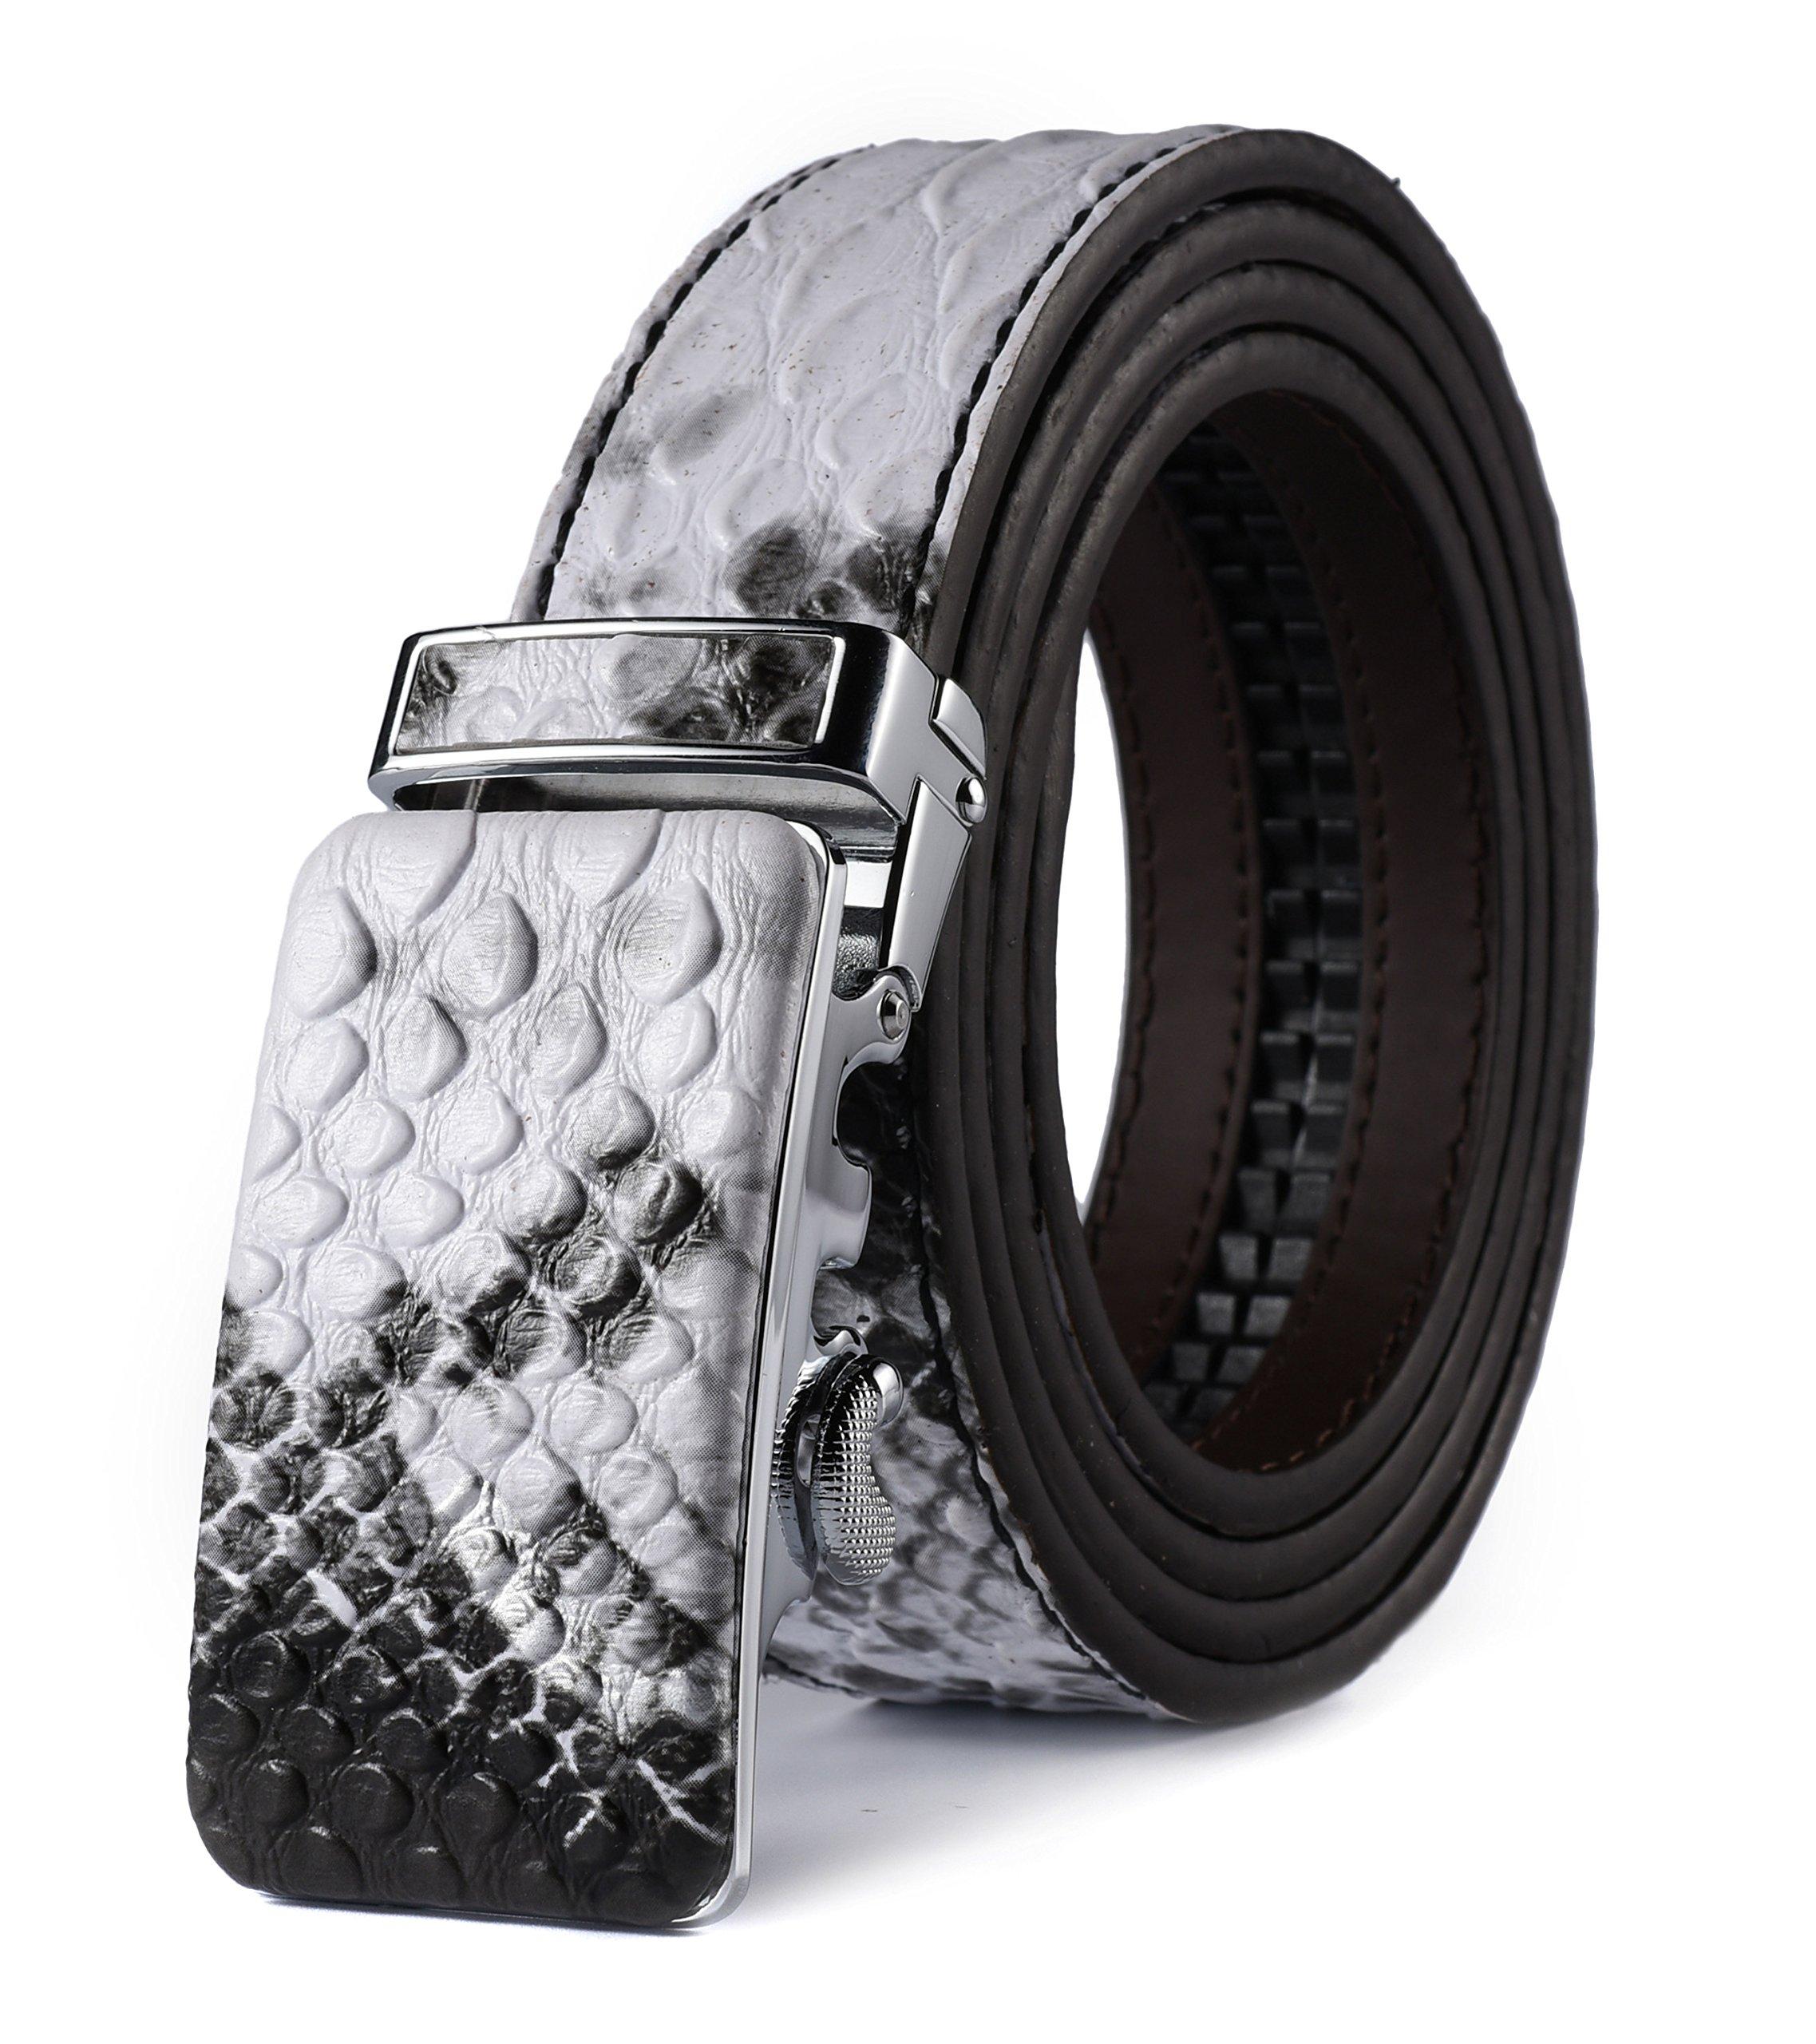 HW Zone Men's Soft Leather Belt Sliding Buckle Ratchet Belt with Automatic Buckle